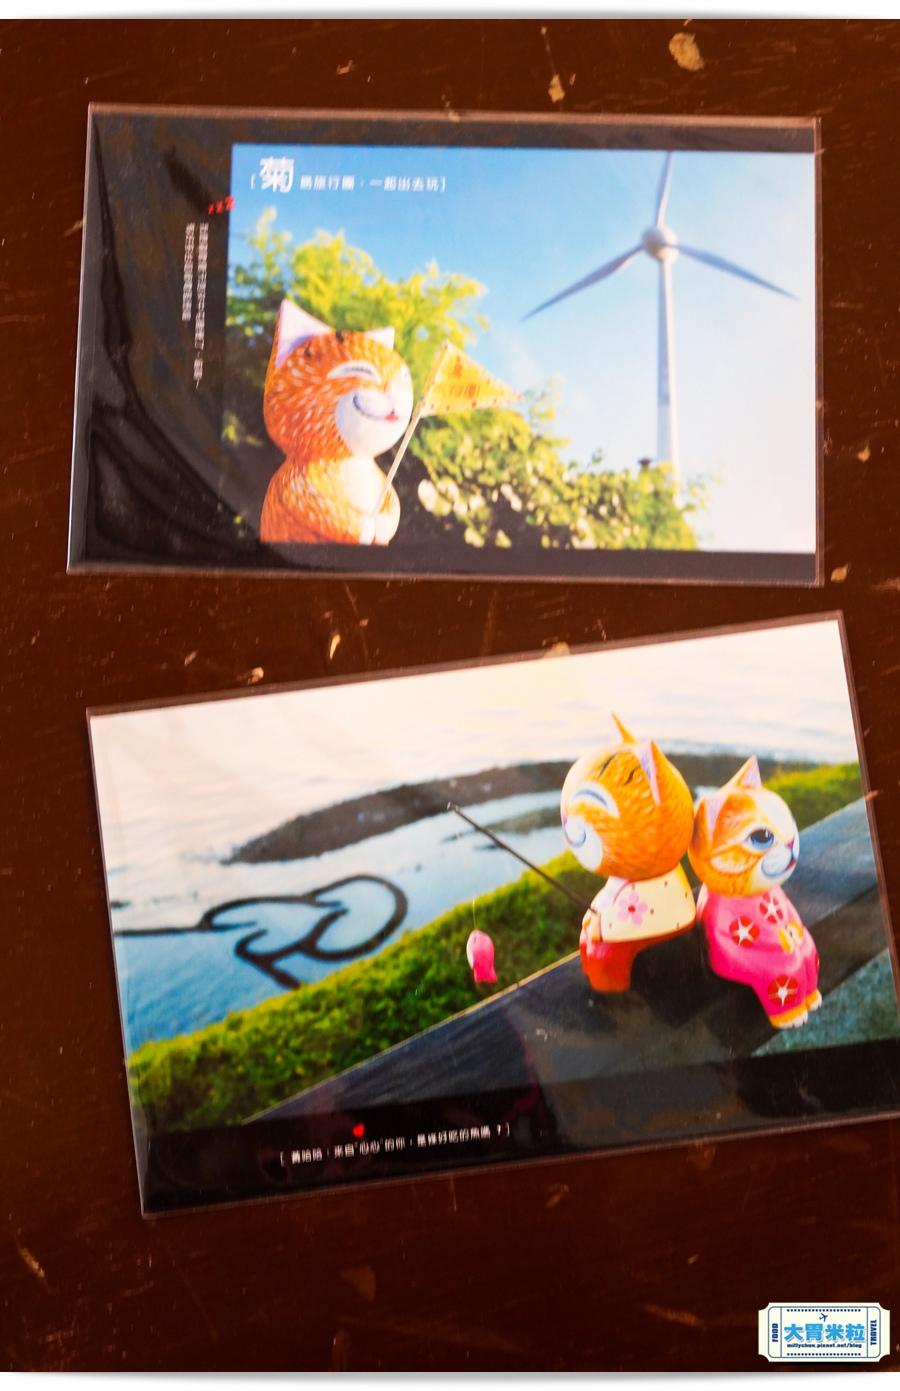 O2Trave散策明信片野餐l0045.jpg